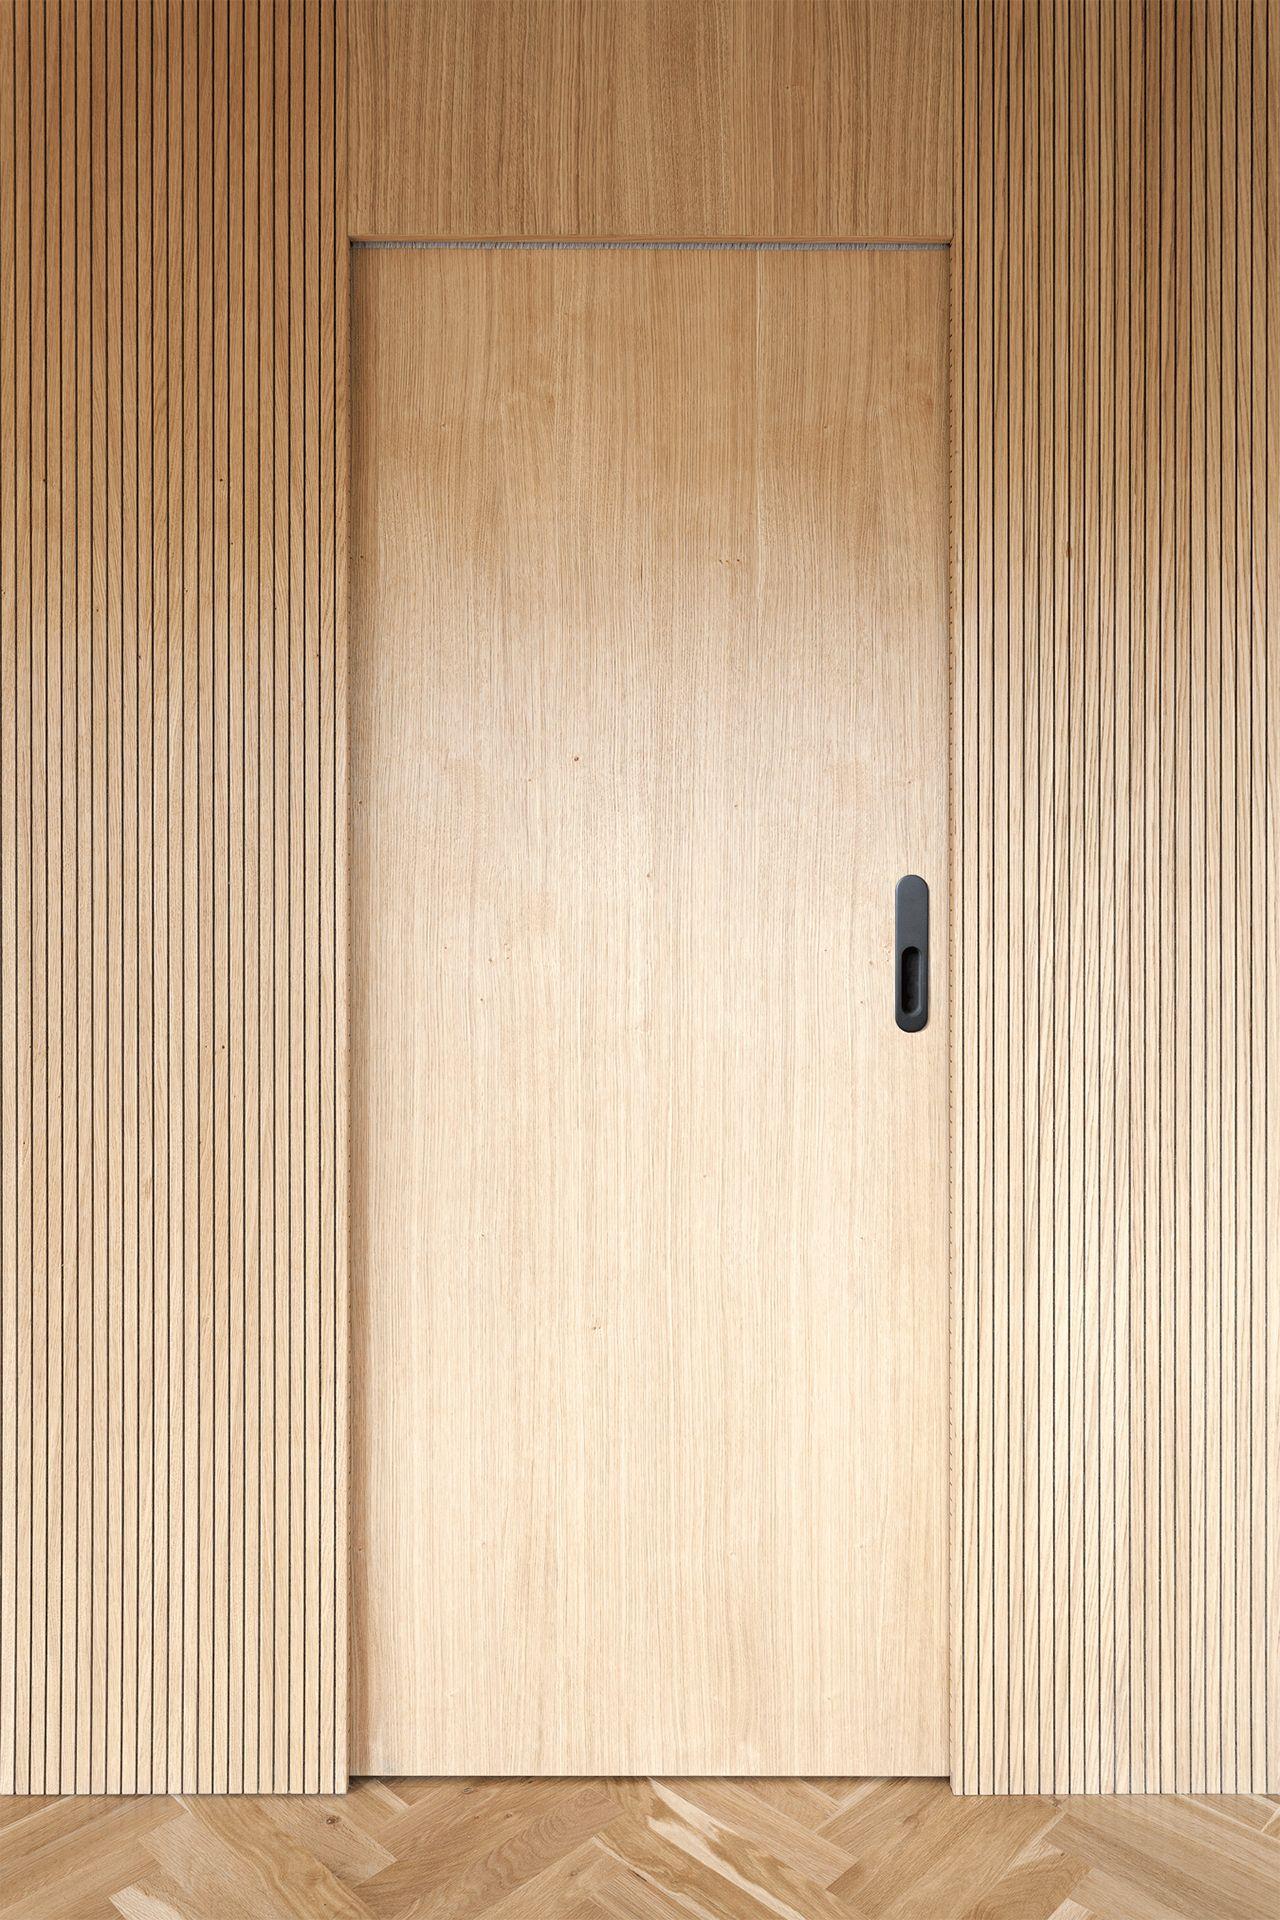 Material combinations and minimal details enrich a Prague ap…